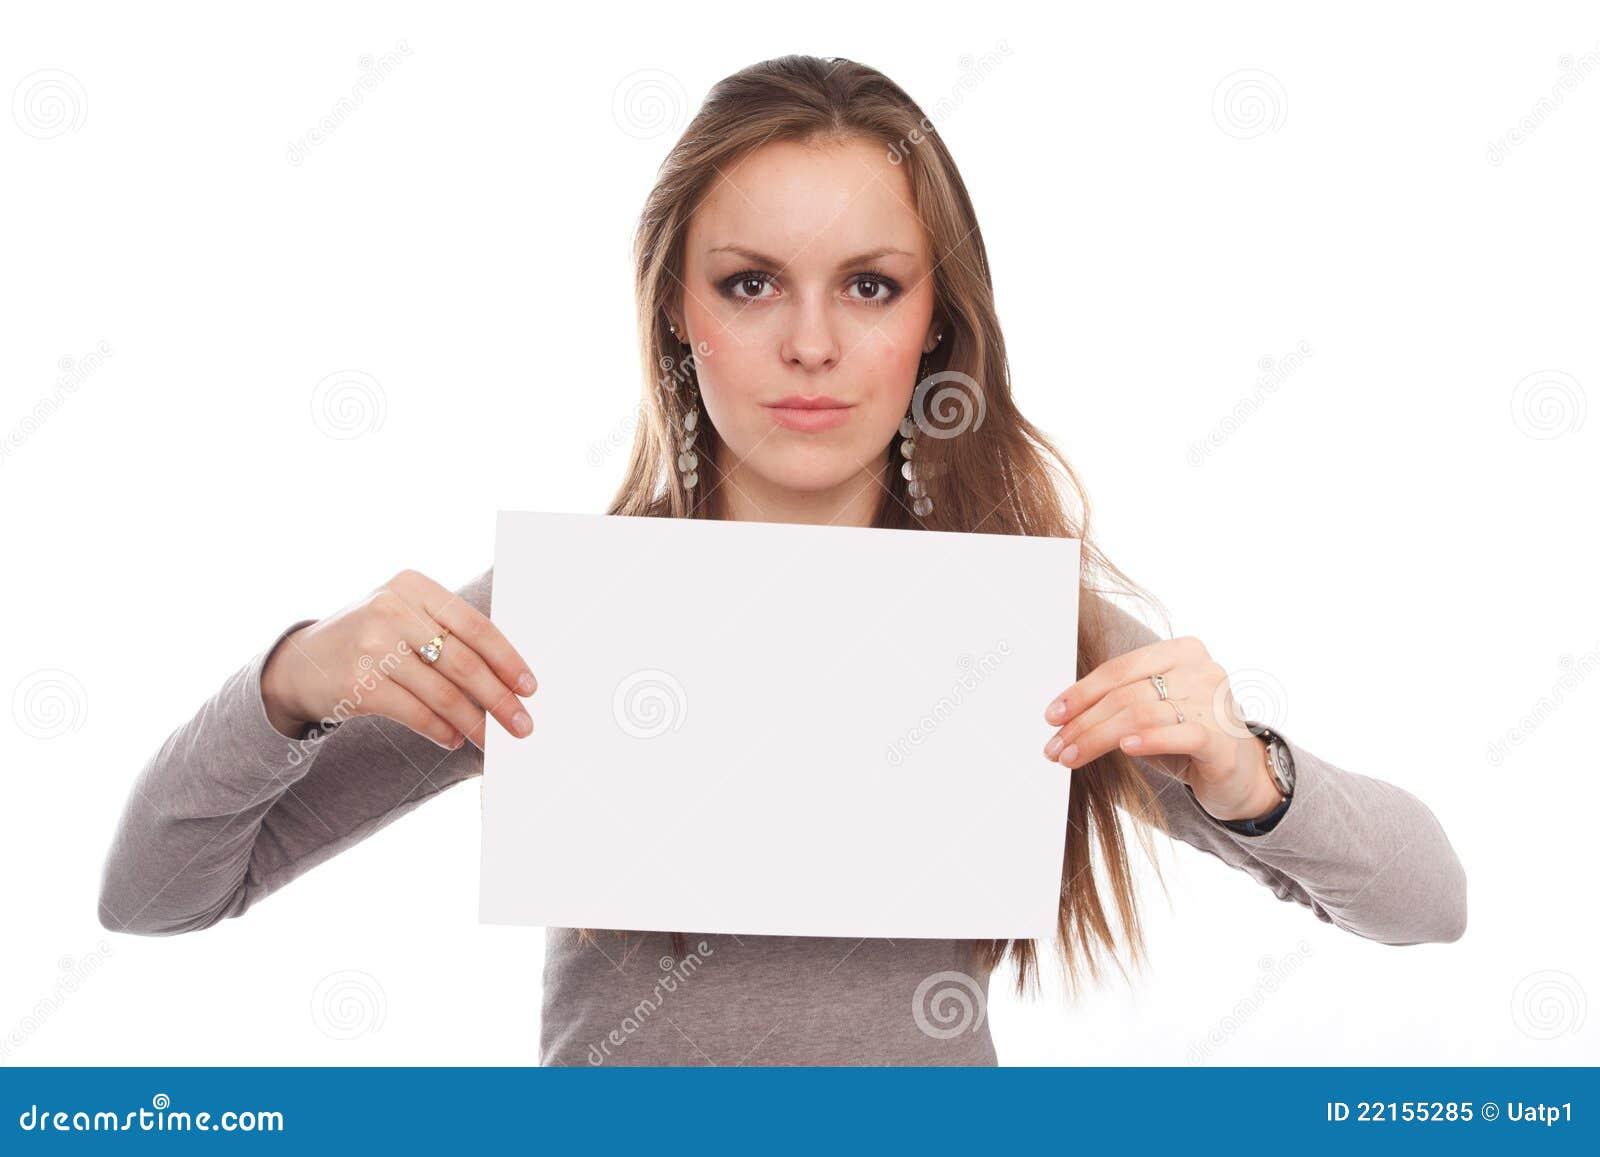 Фото девушка с бумагой